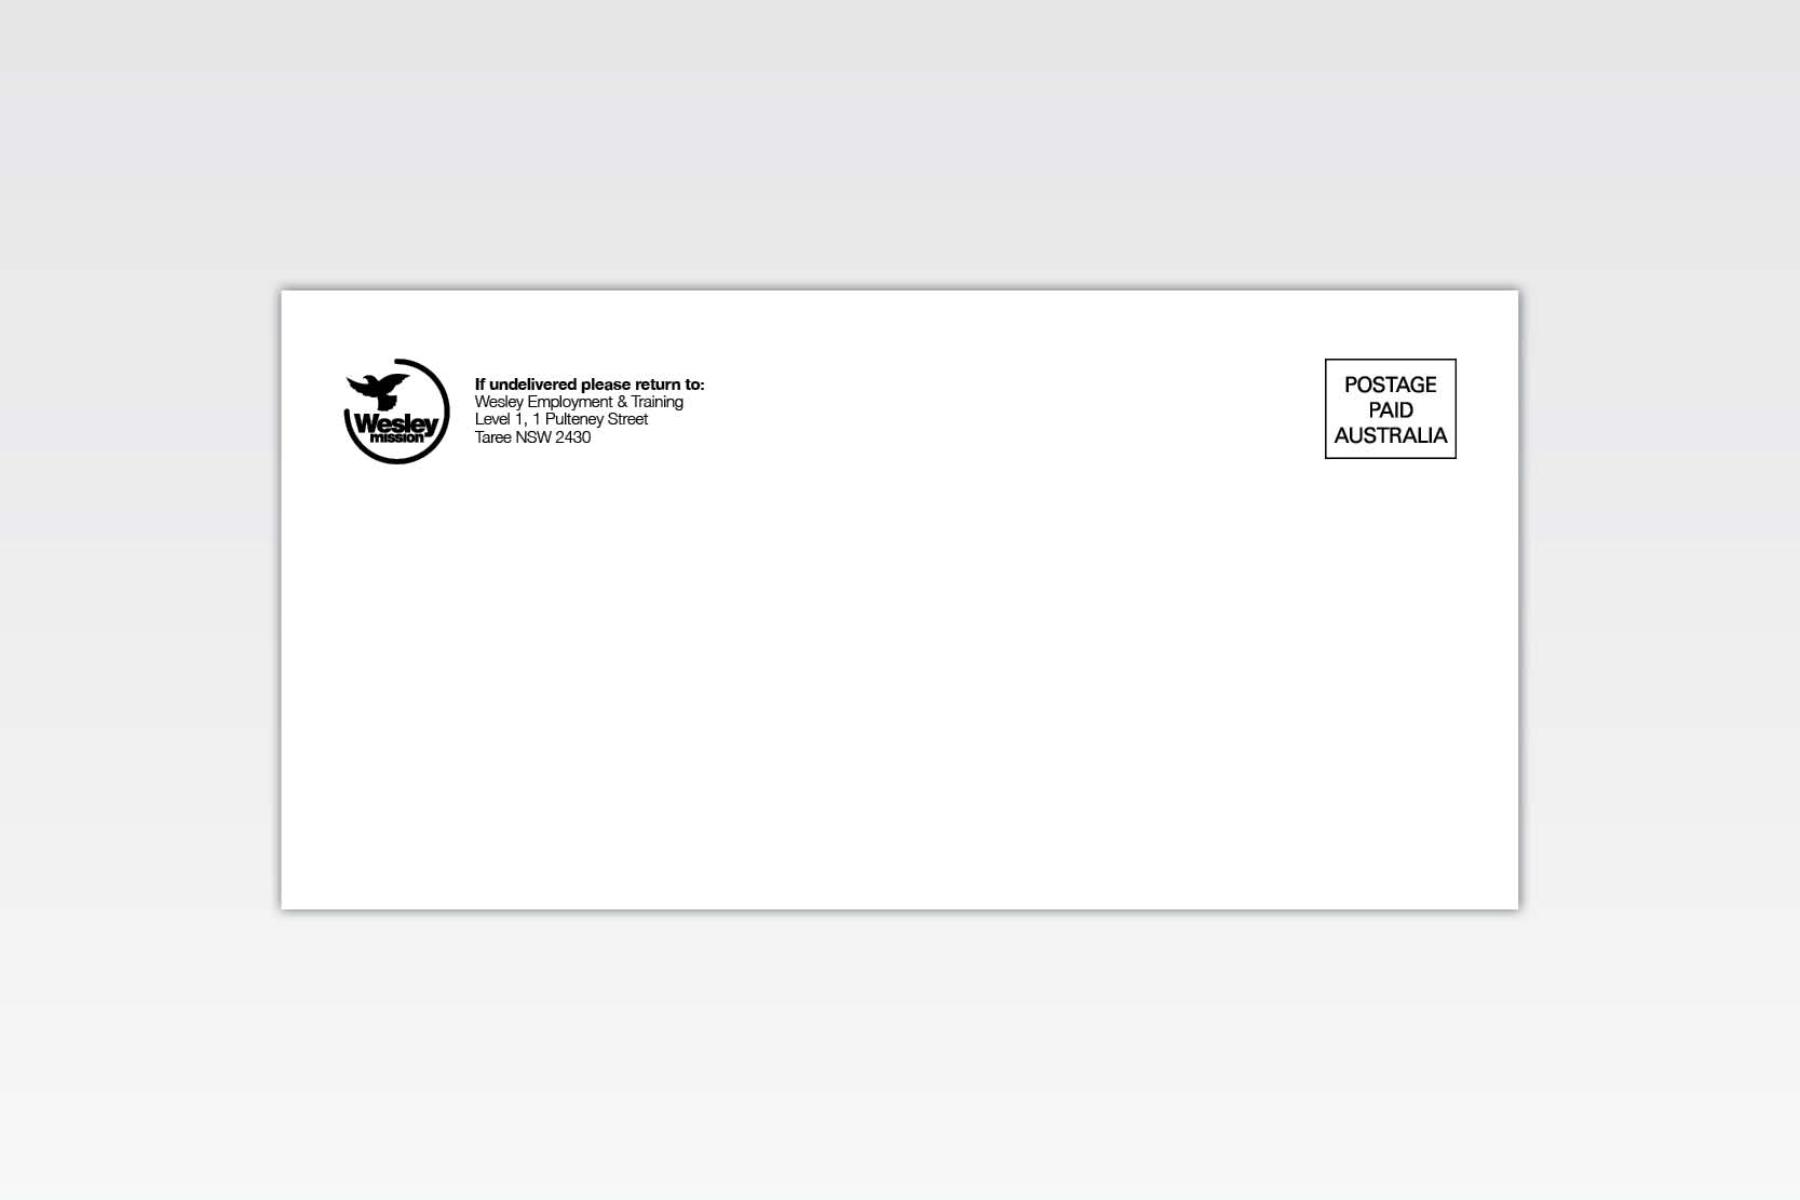 DLX Envelopes